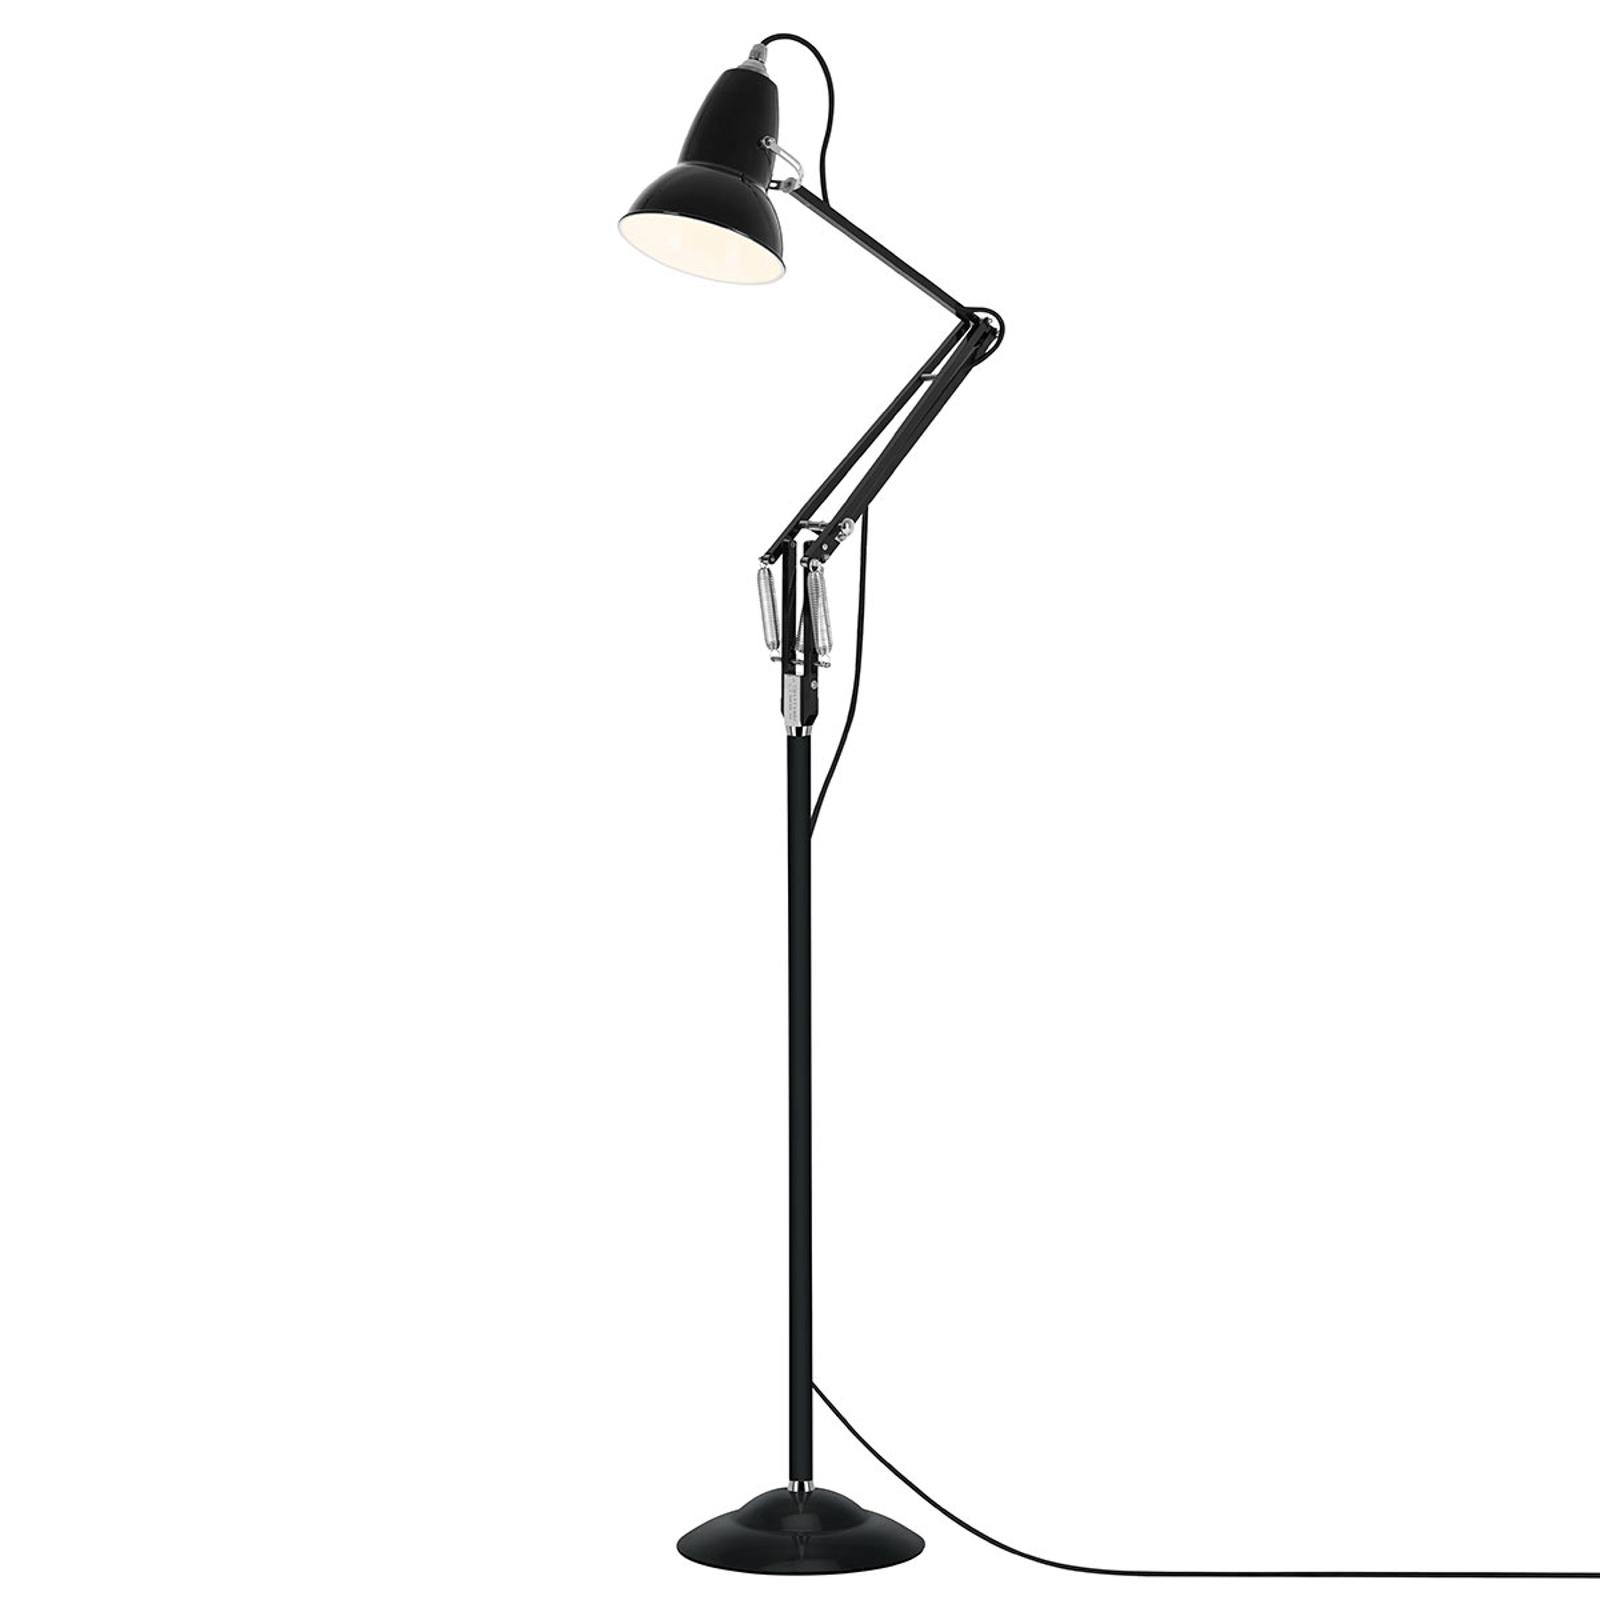 Anglepoise Original 1227 Stehlampe samtschwarz